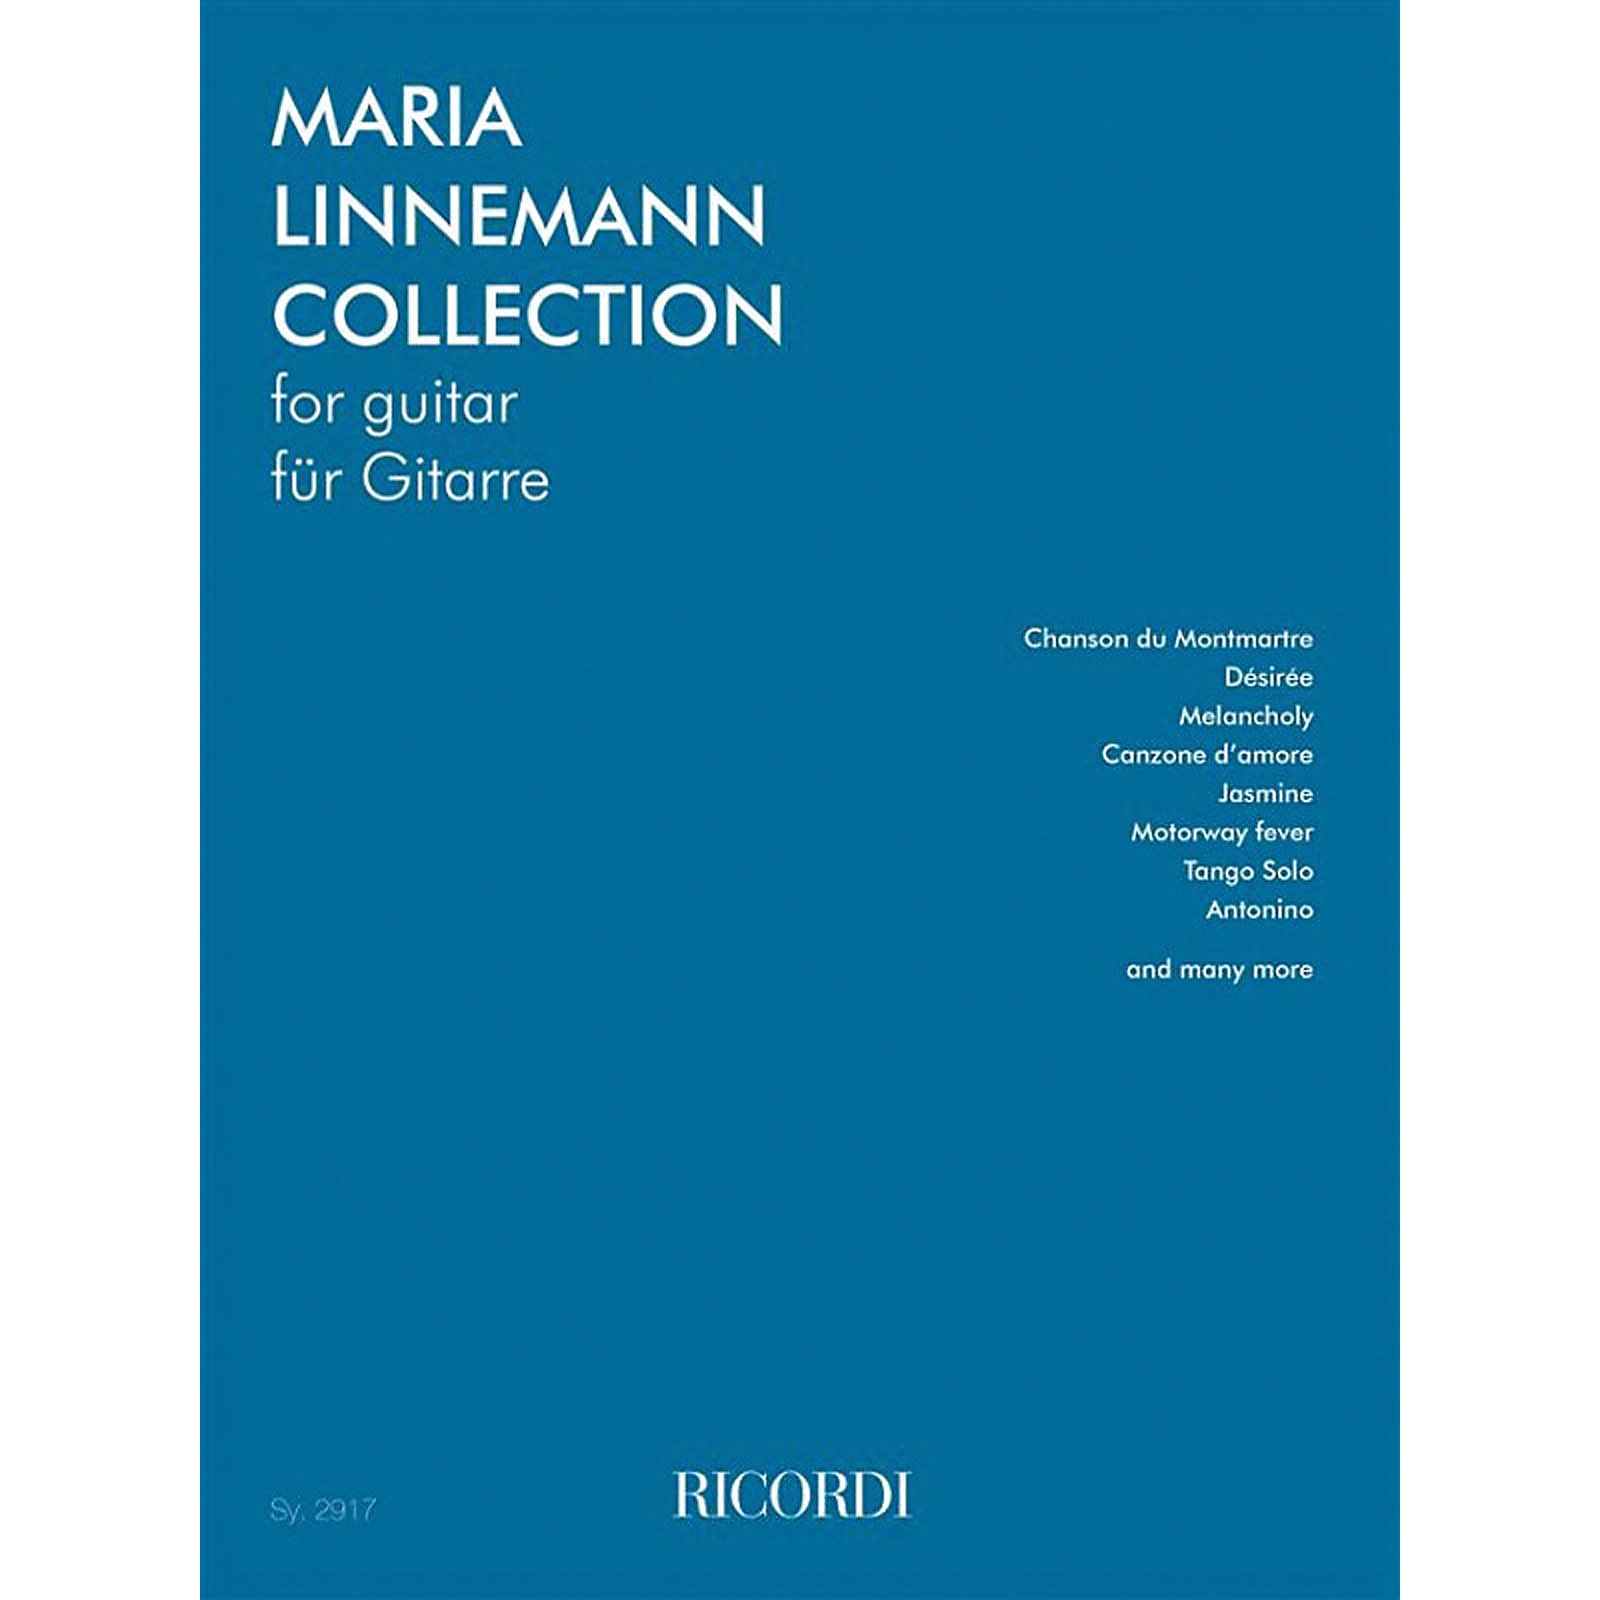 Ricordi Maria Linnemann Collection for Guitar Guitar Series Softcover